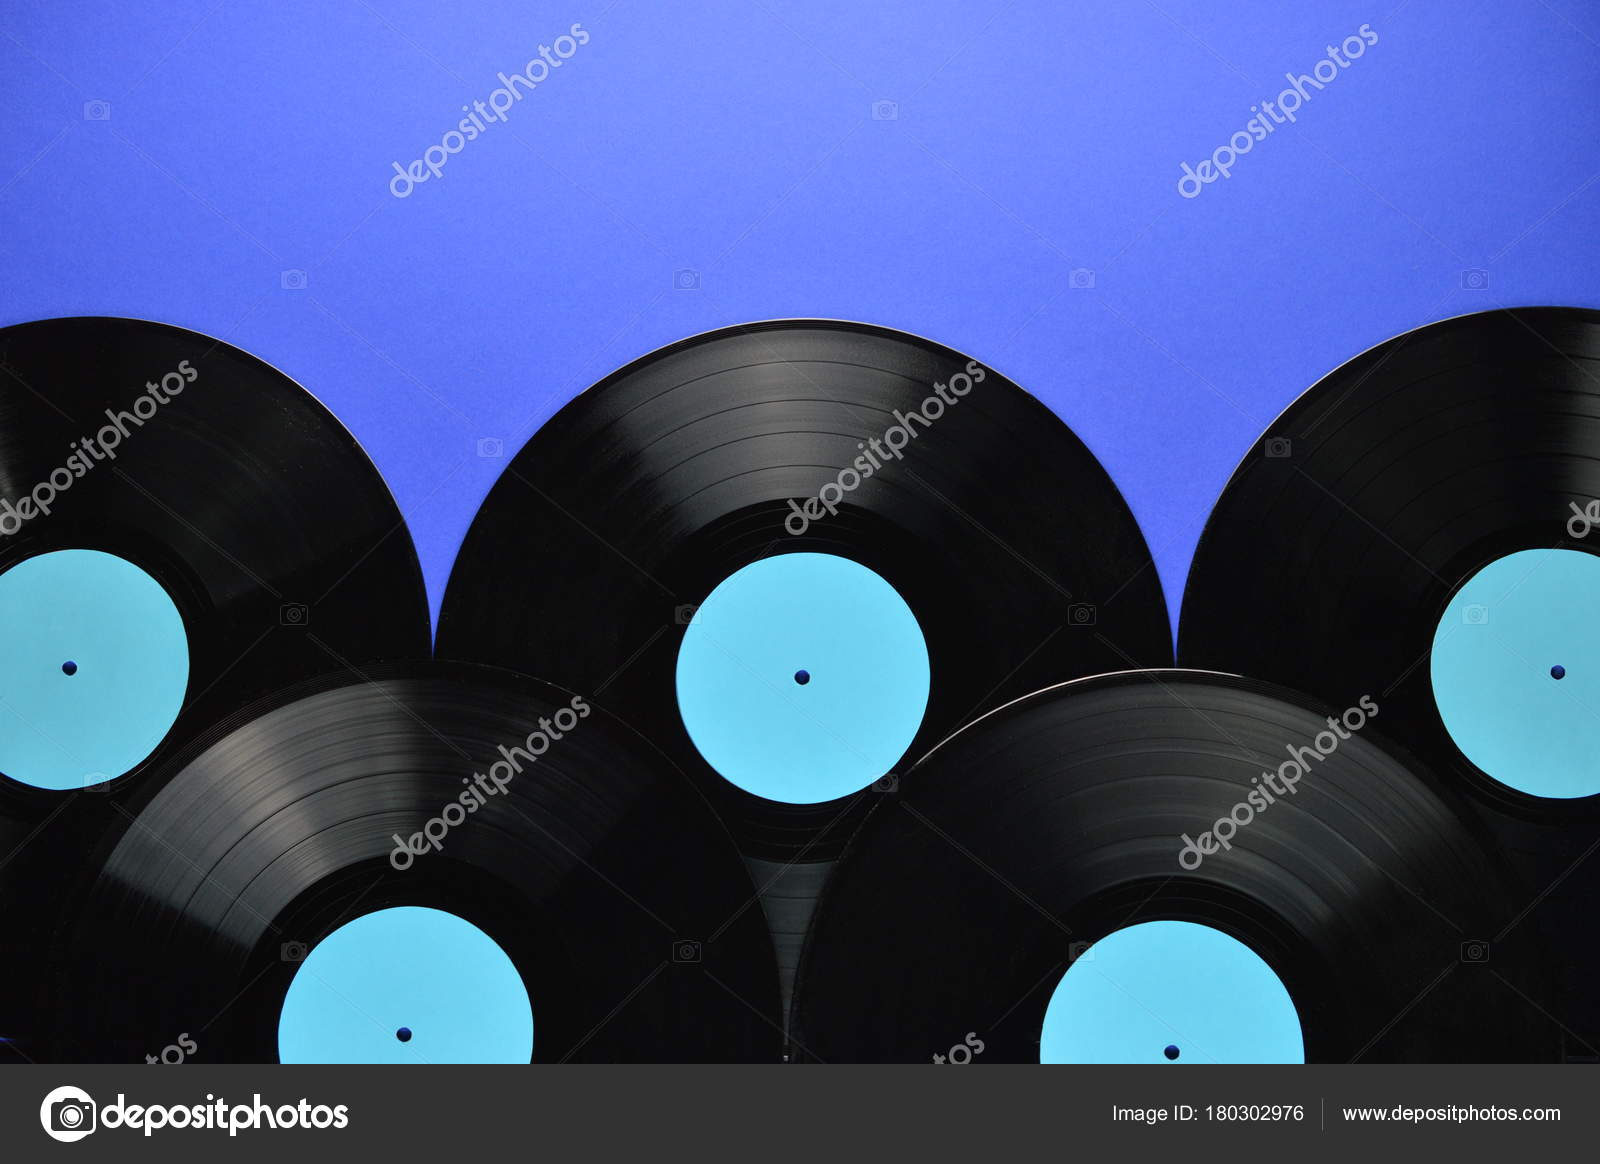 border old black vinyl records blank cyan labels blue background